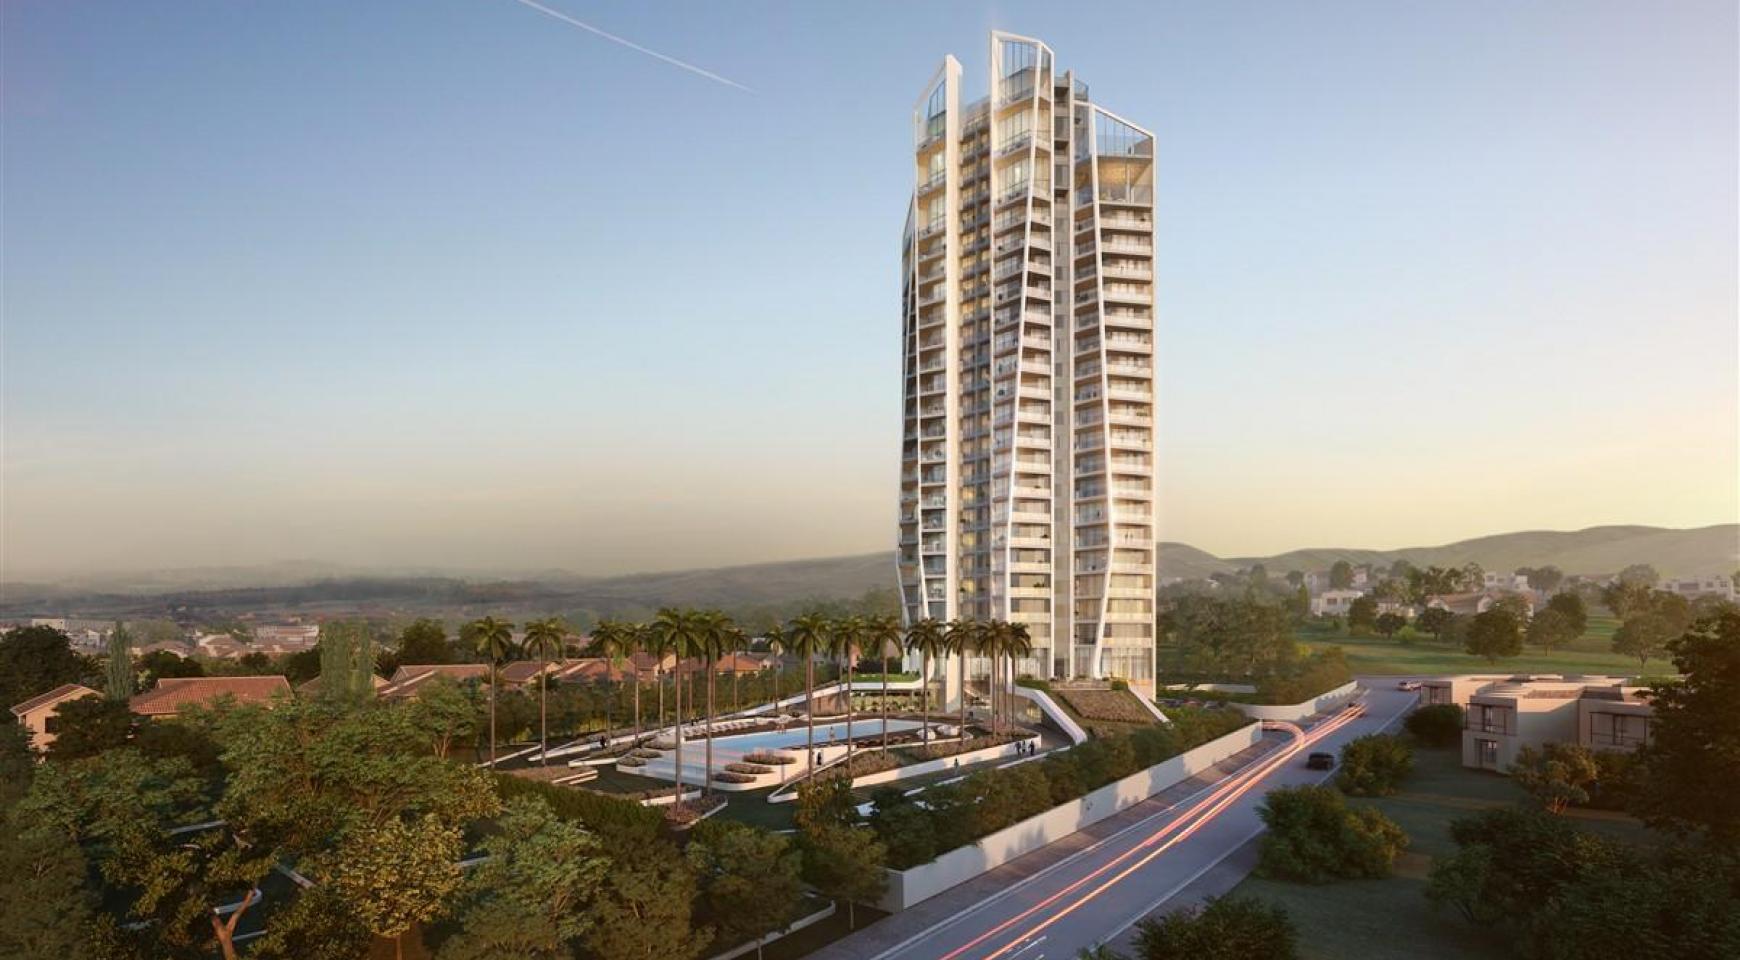 Sky Tower. Μοντέρνο ευρύχωρο διαμέρισμα ενός υπνοδωματίου με θέα στην θάλασσα - 2